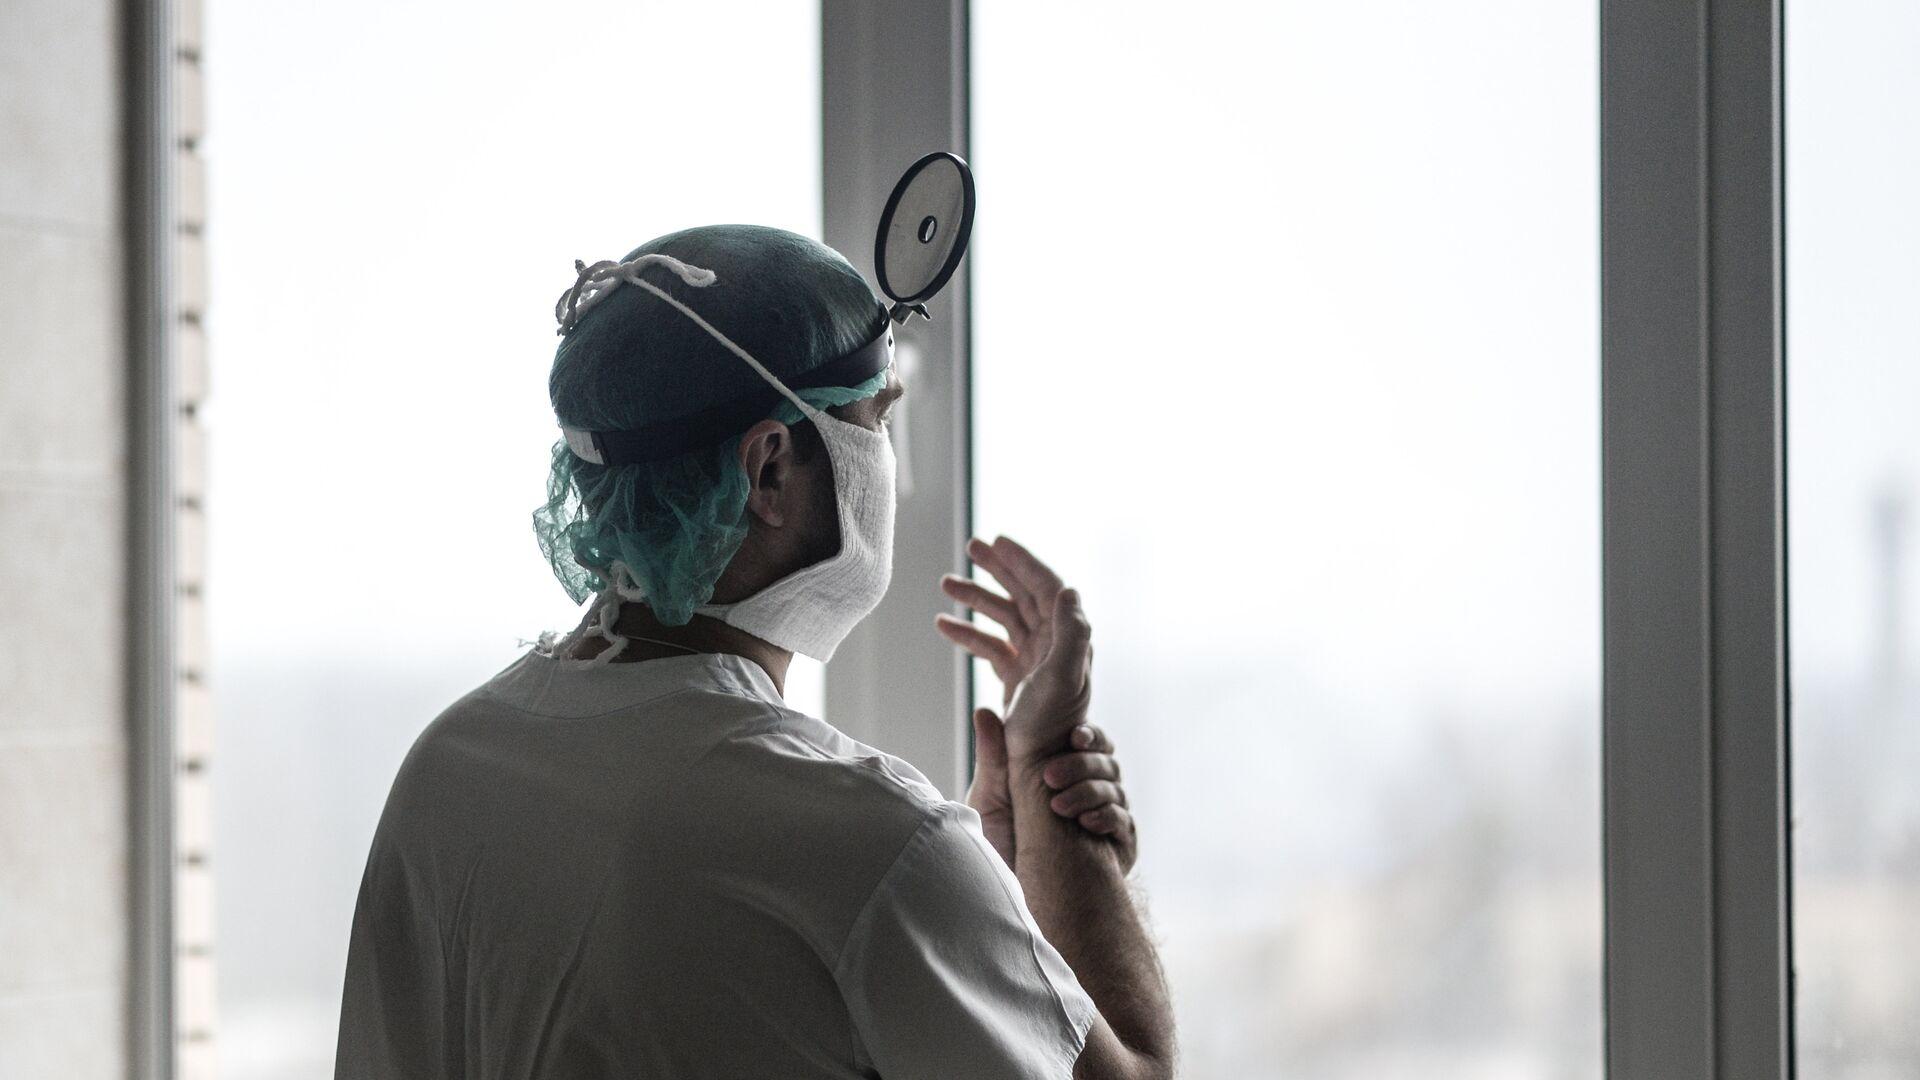 Dottore in ospedale - Sputnik Italia, 1920, 09.09.2021